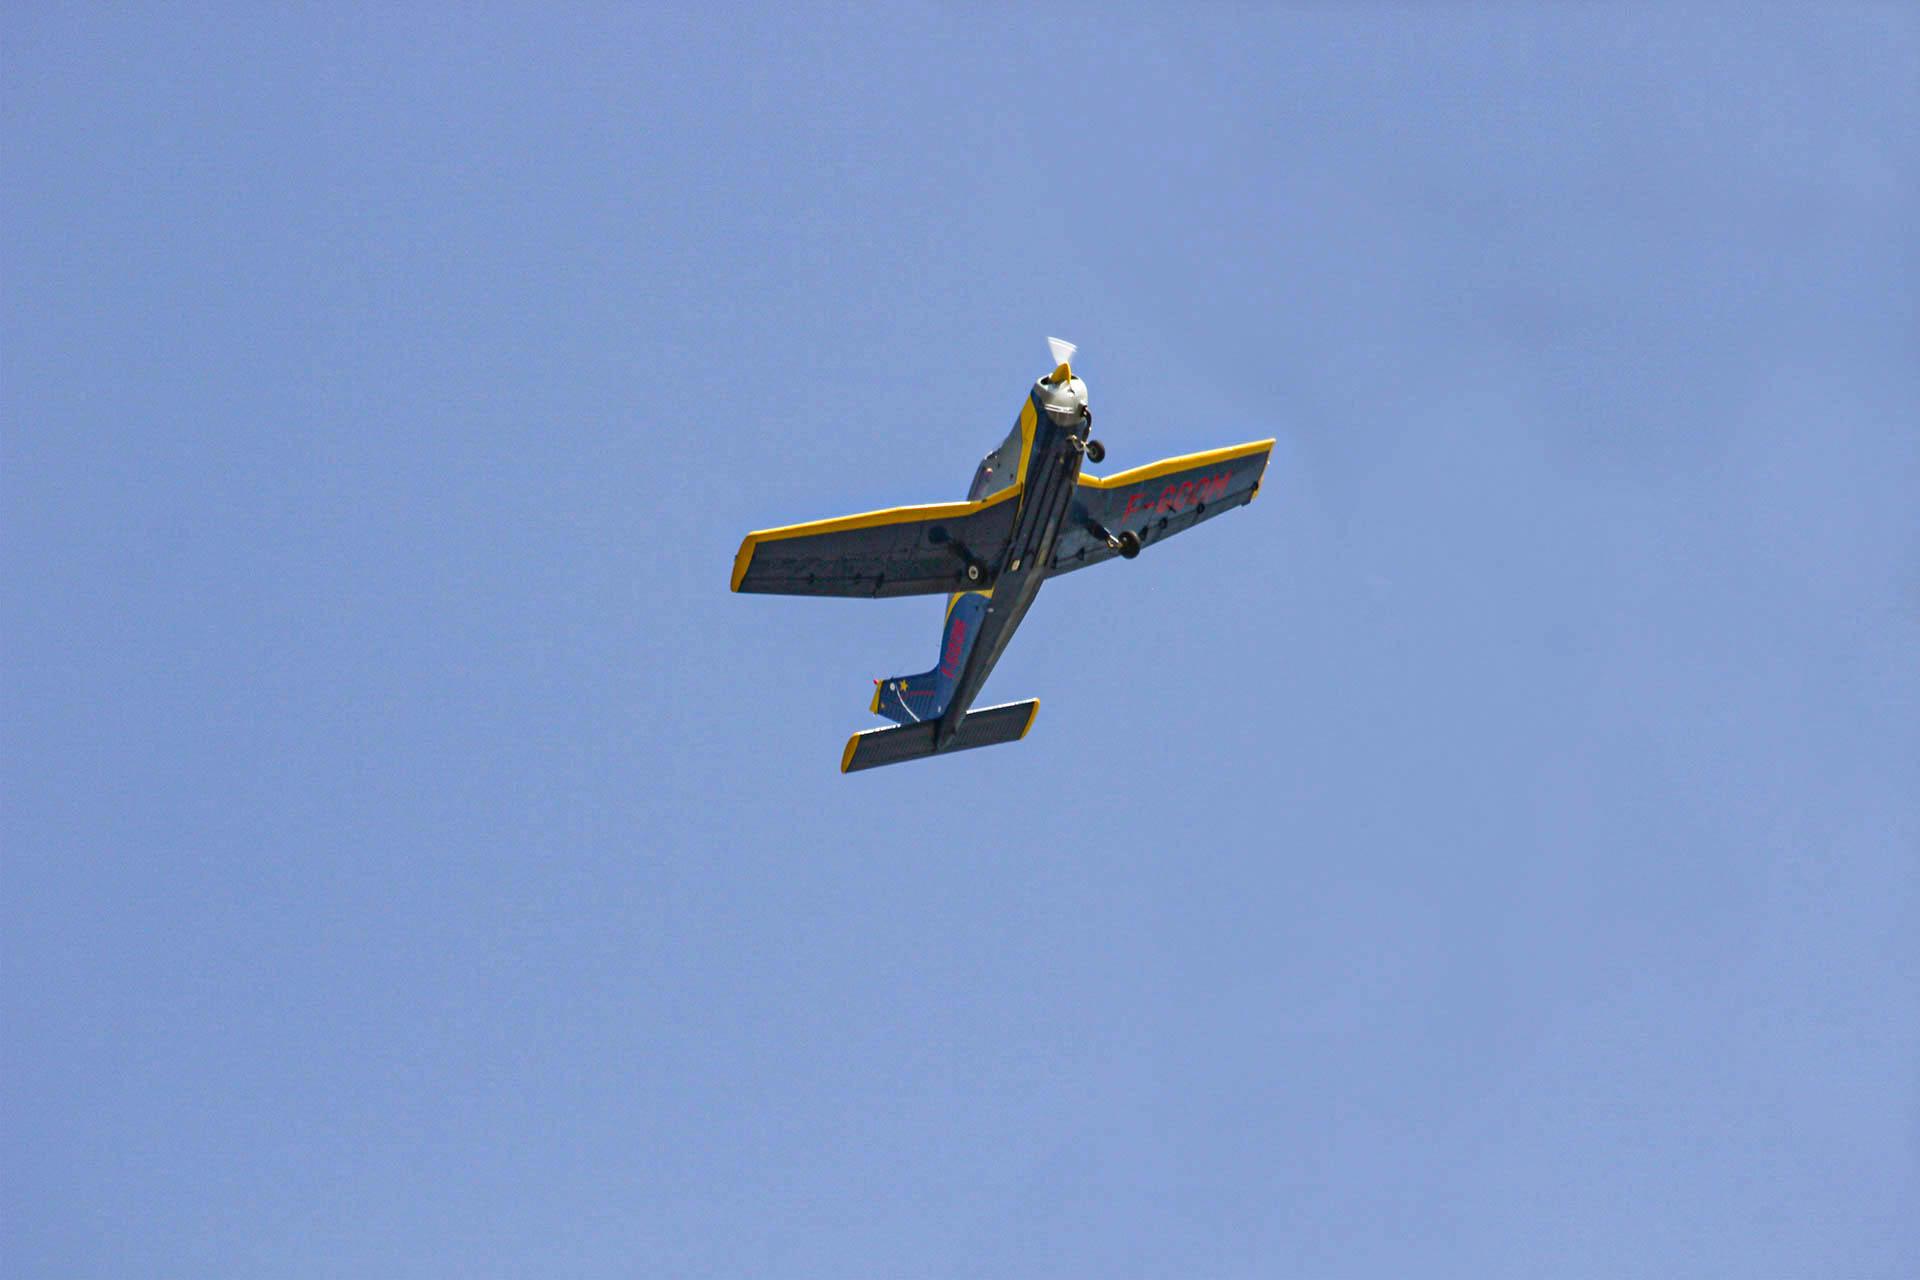 Aeronautique Piper – Agnes Briand Photographe